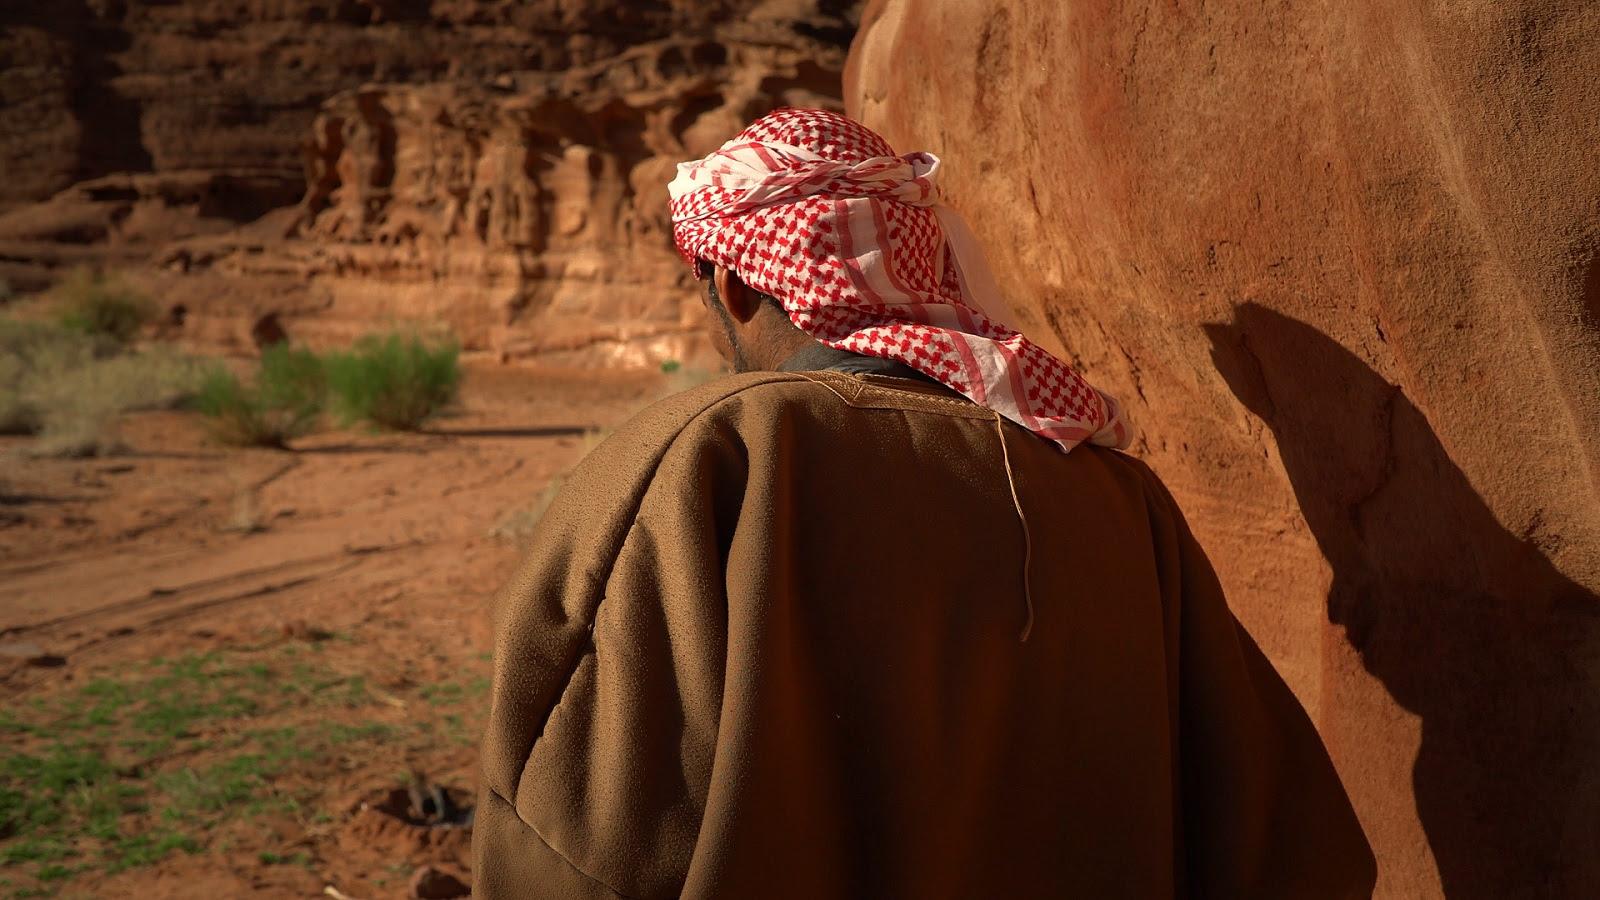 A Bedouin in the Wadi Rum